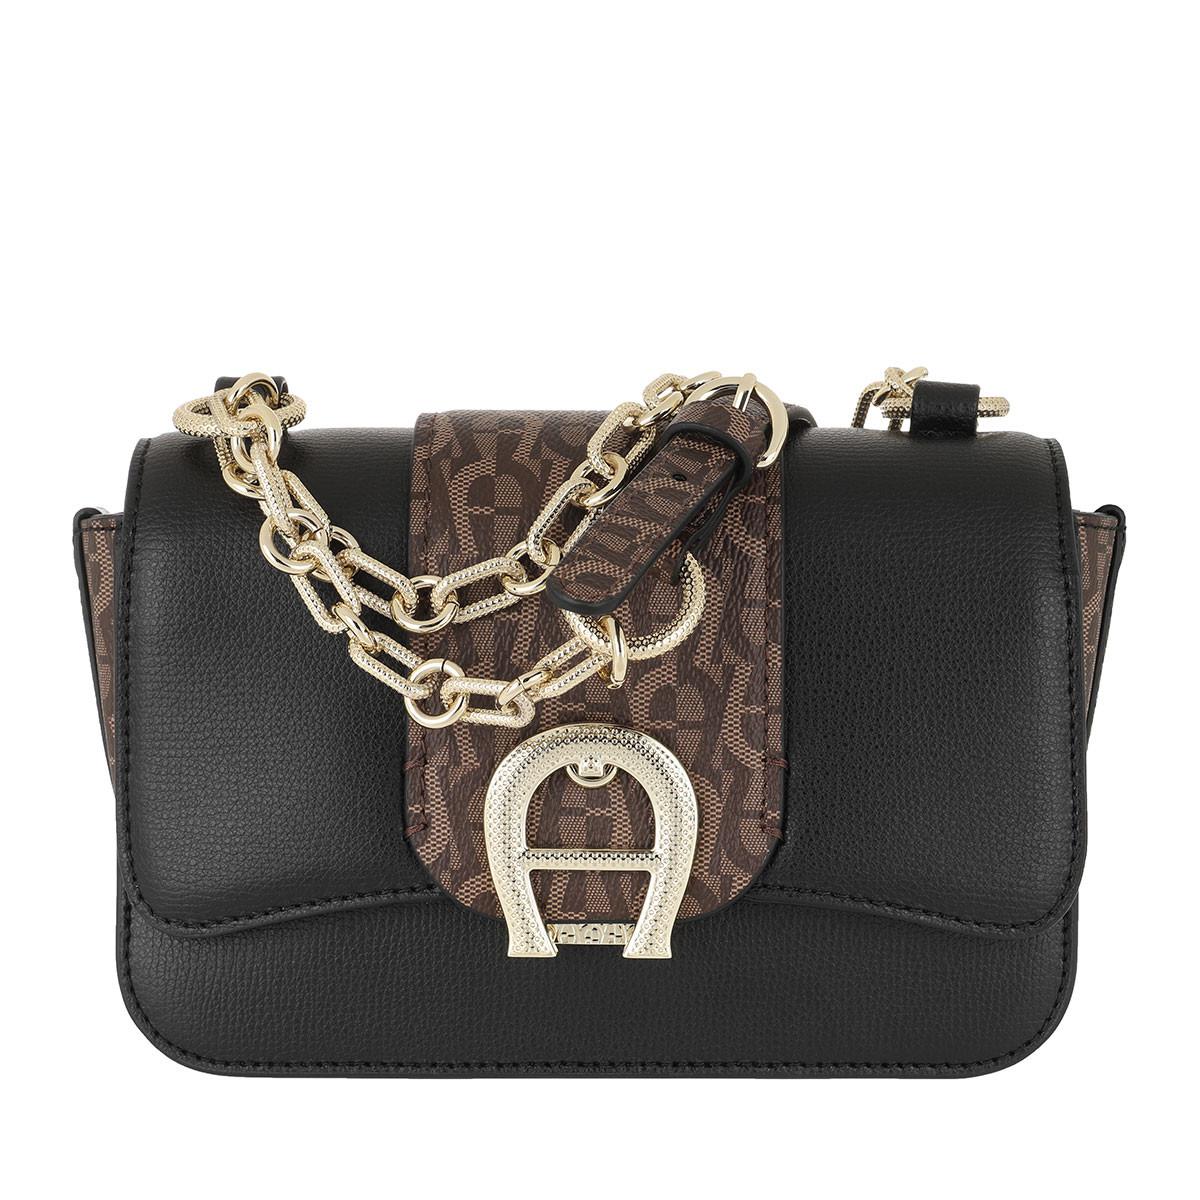 Aigner Umhängetasche - Verona Small Crossbody Bag Fango - in schwarz - für Damen